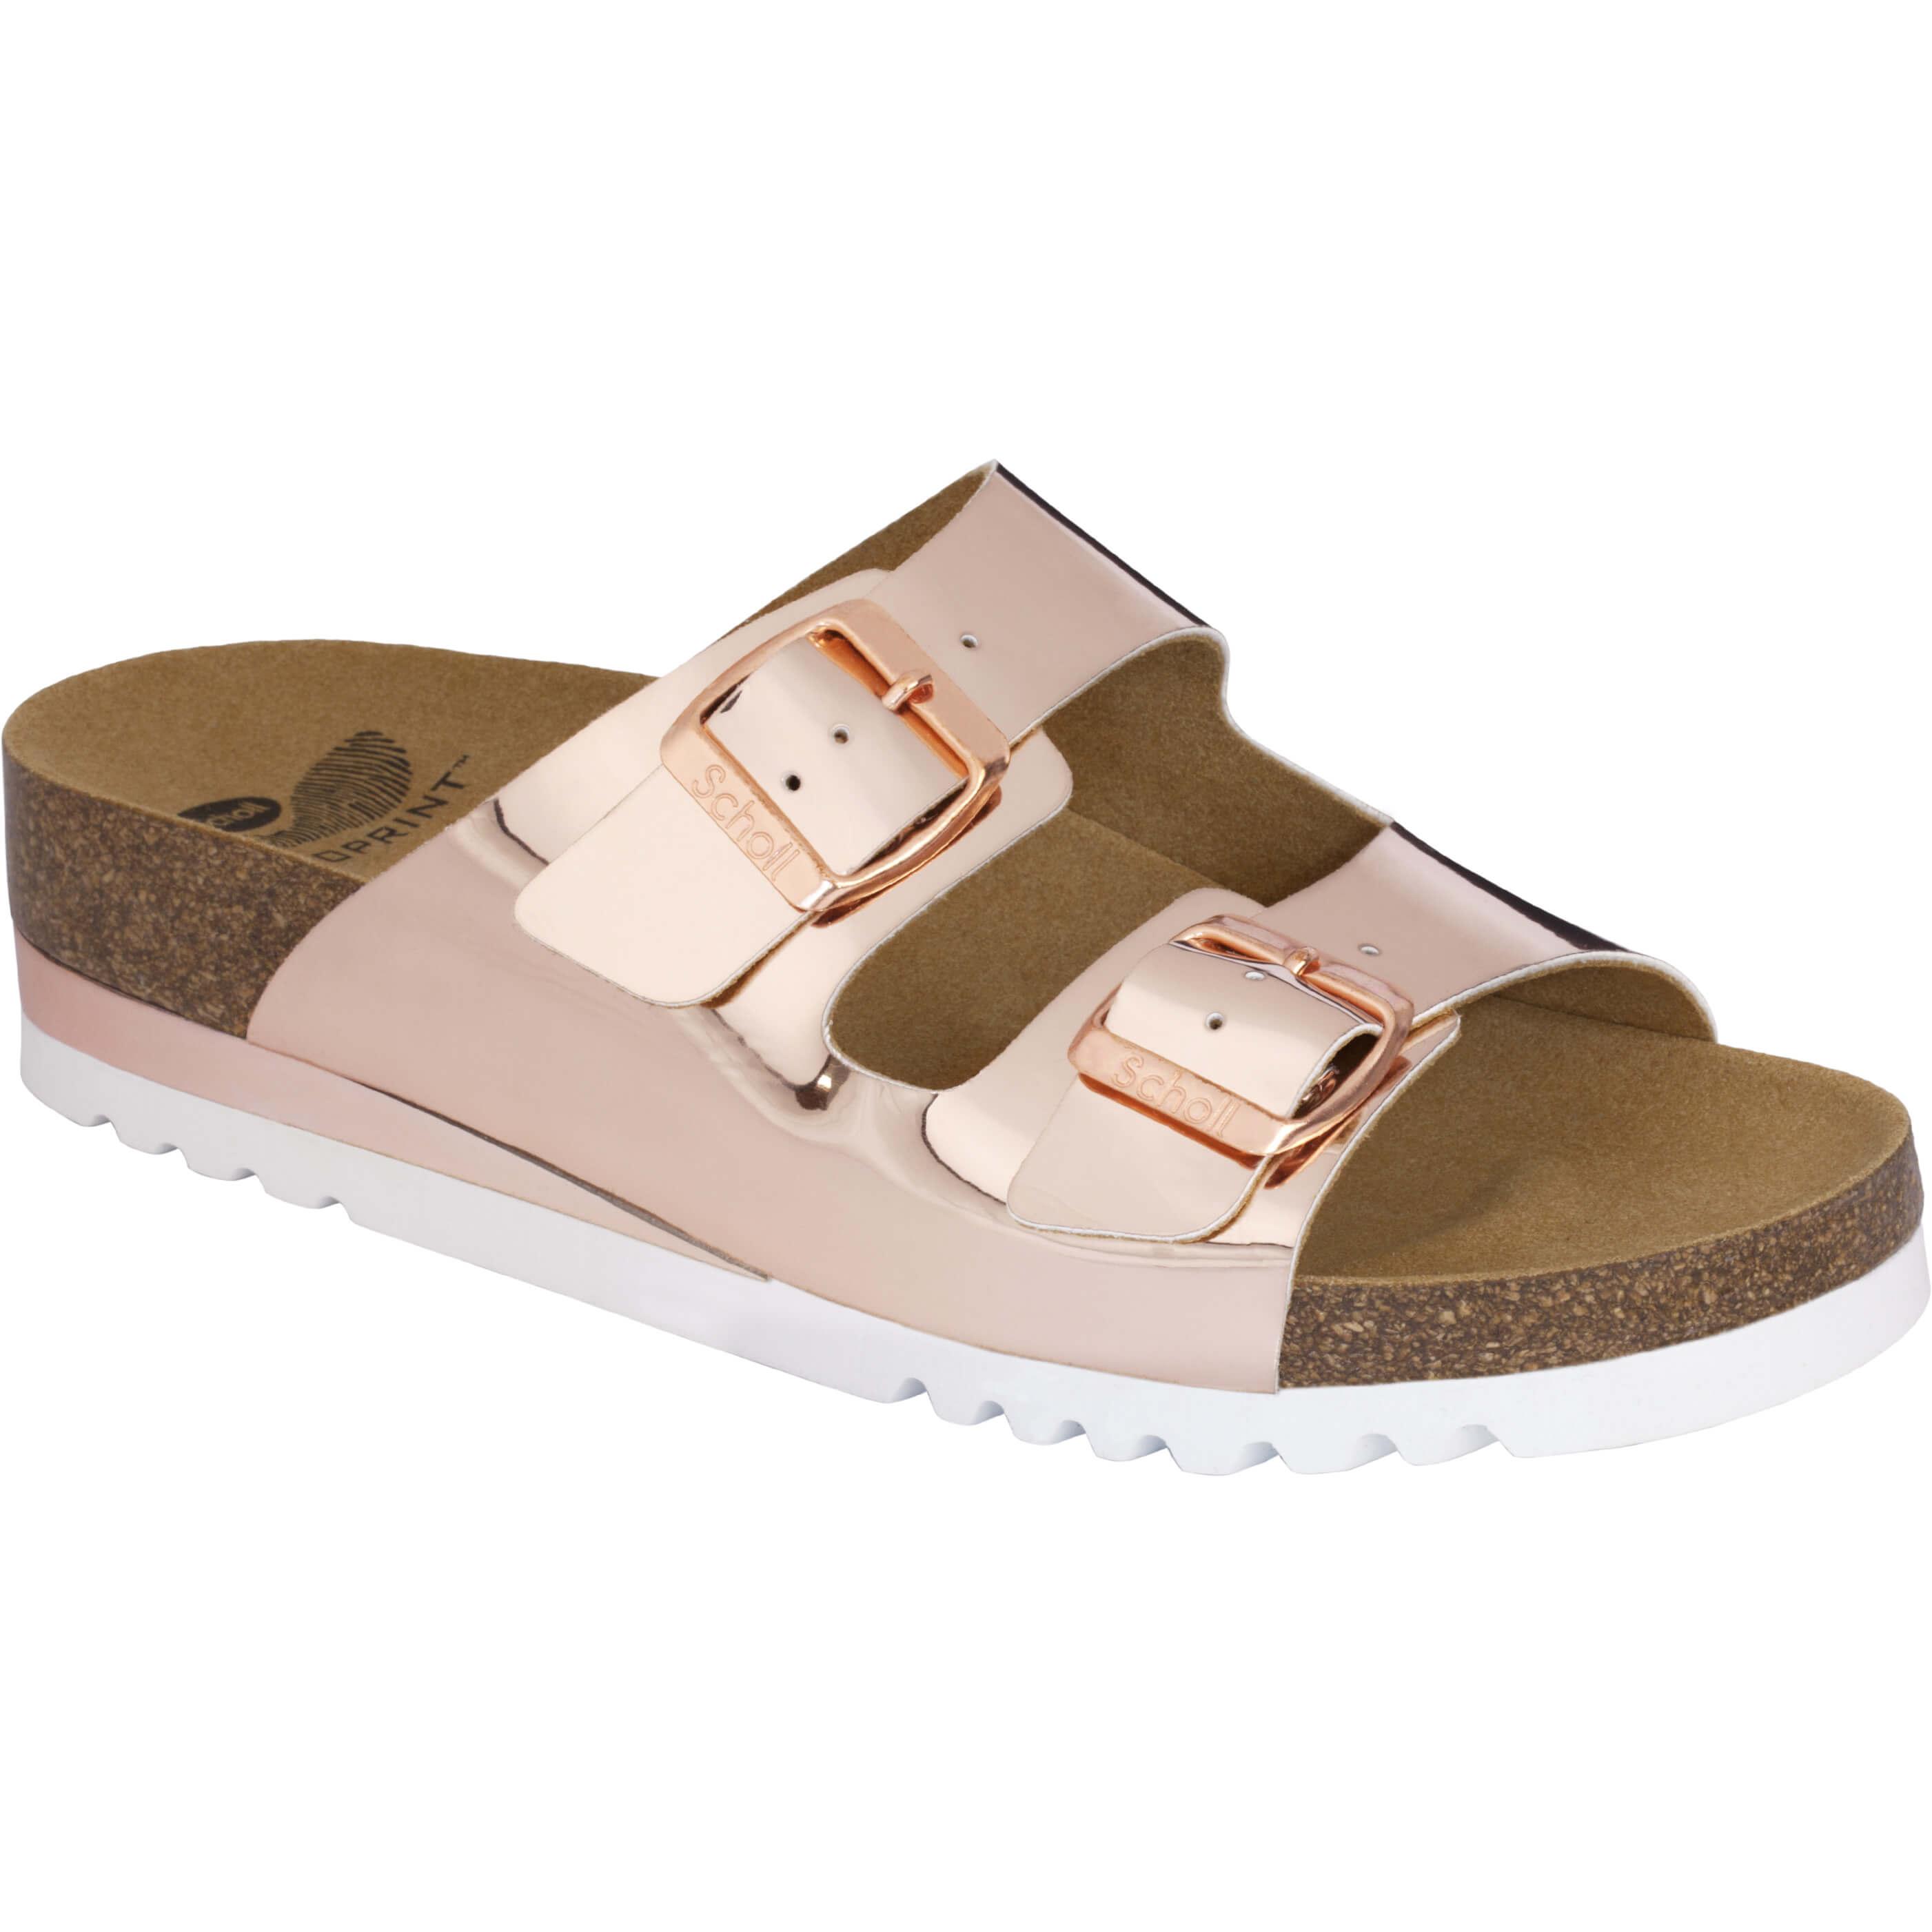 ba4851dfb8d Dr Scholl Shoes Glam SS 2 Bronze ΝΕΟ Γυναικεία Ανατομικά Παπούτσια Χαρίζουν  Σωστή Στάση & Φυσικό